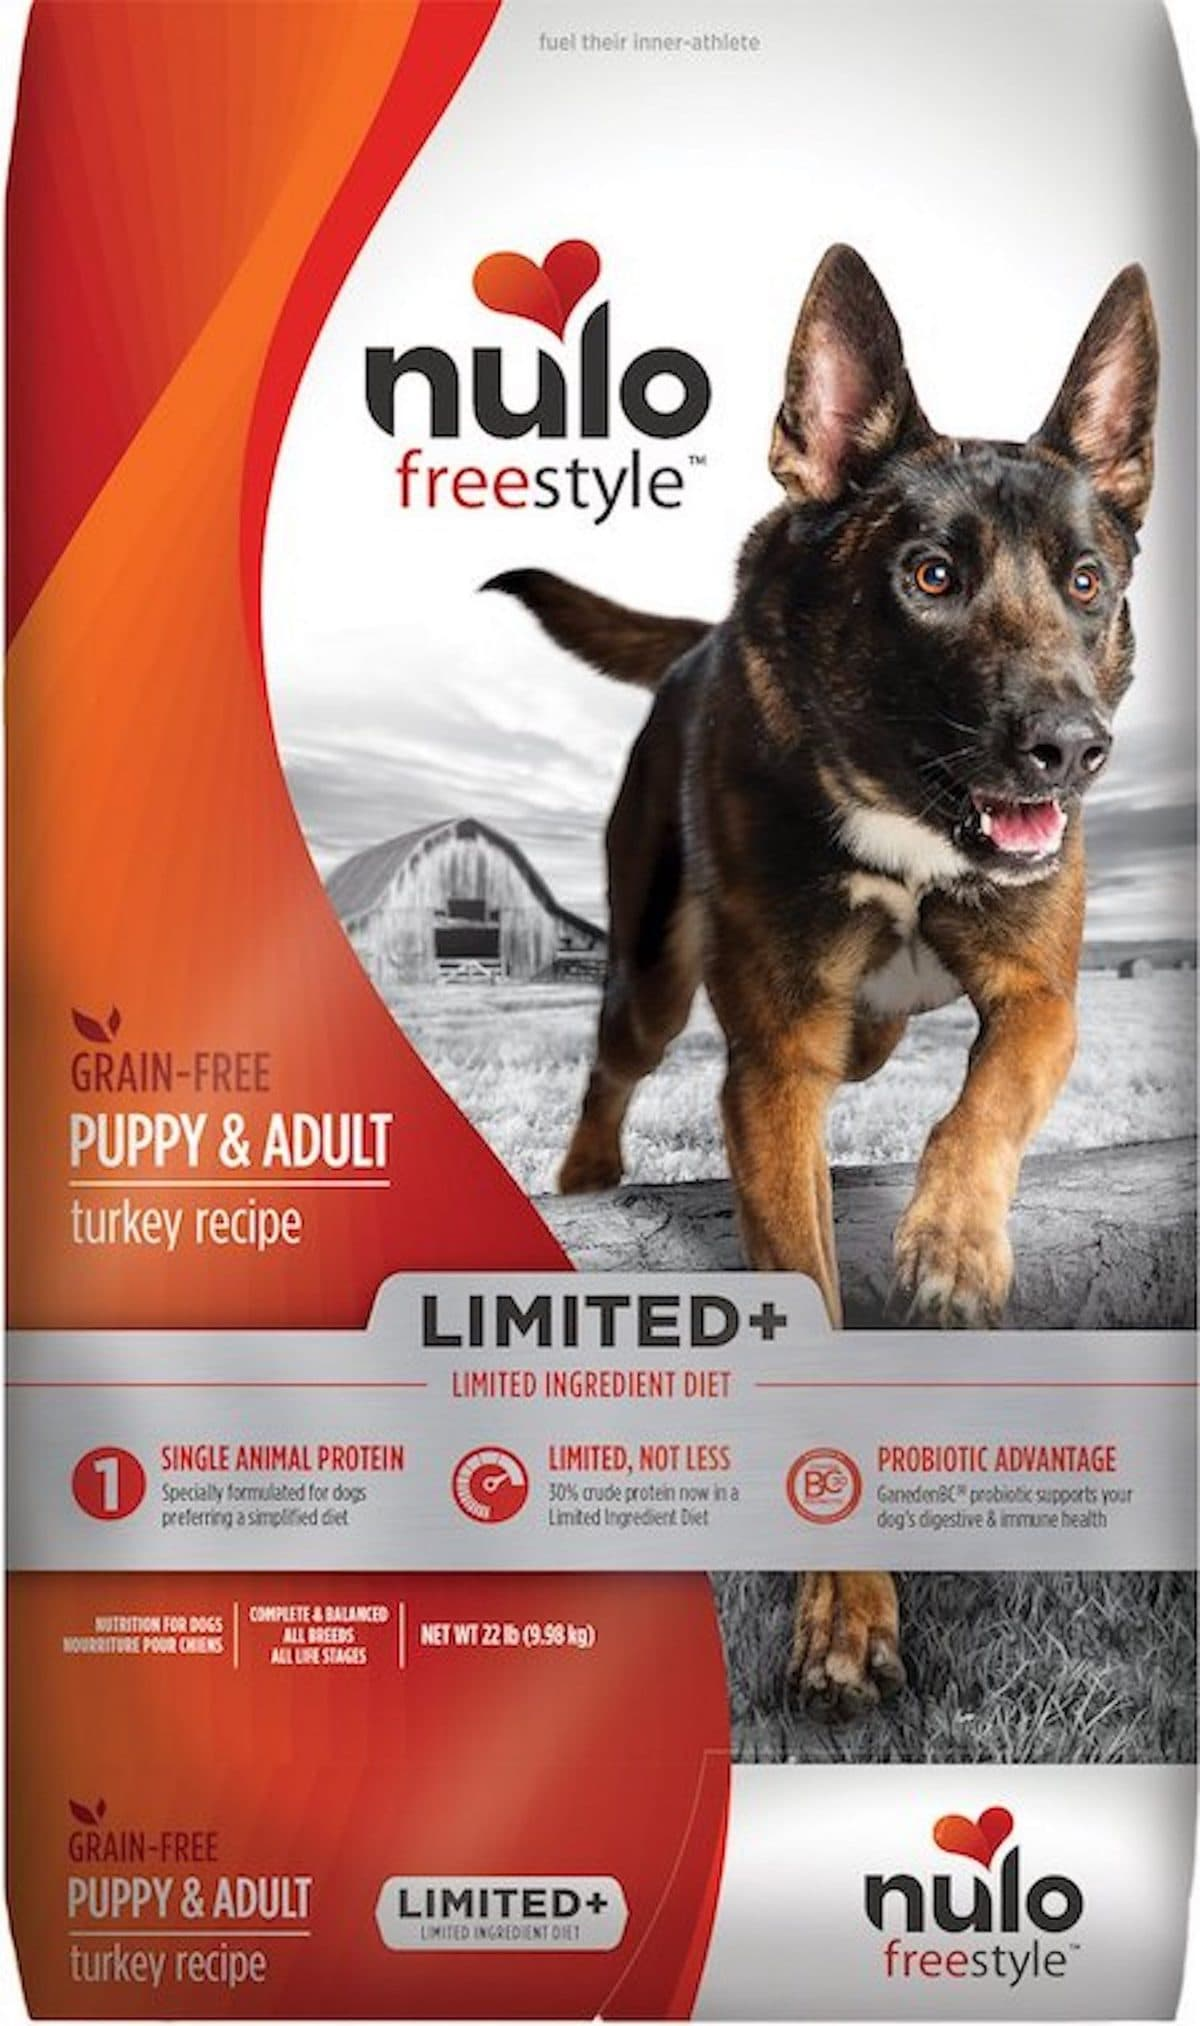 Nulo Freestyle Limited+ Turkey Grain-Free